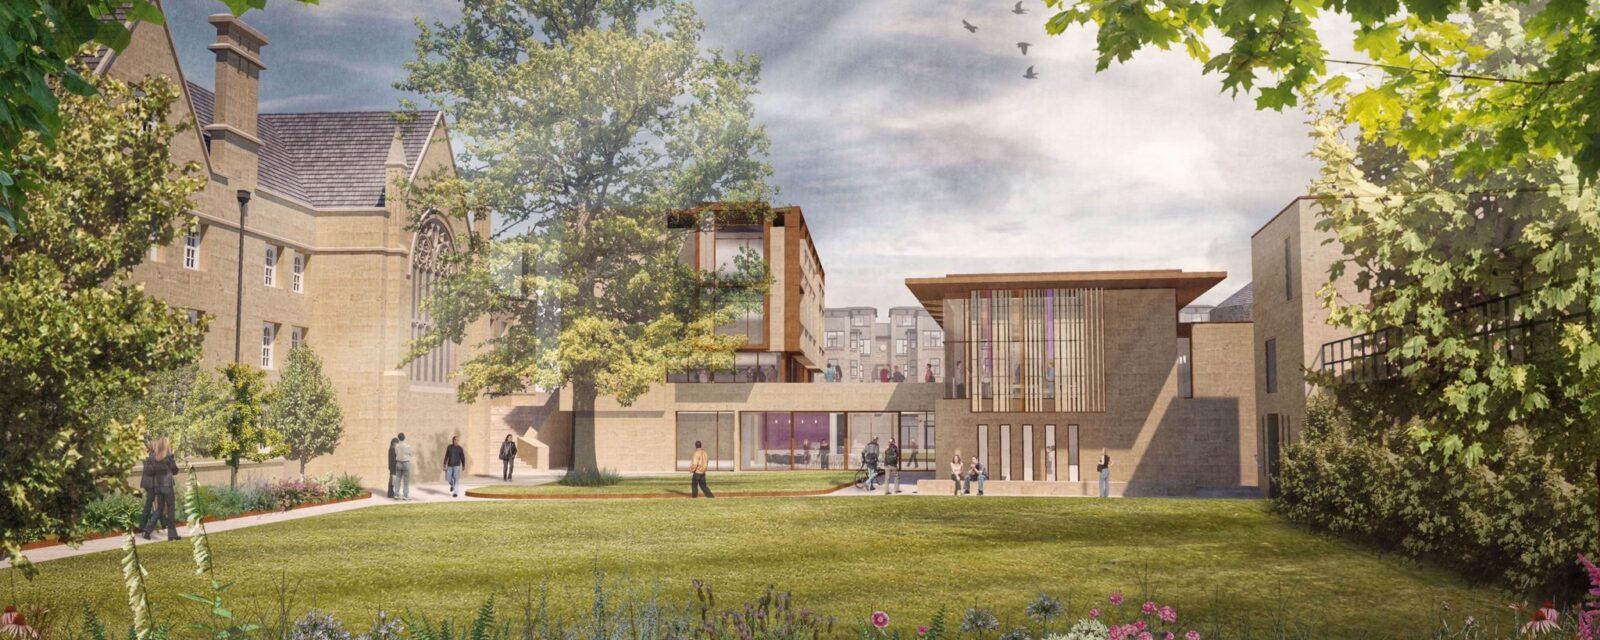 DesignEngine Wadham College Visualisation